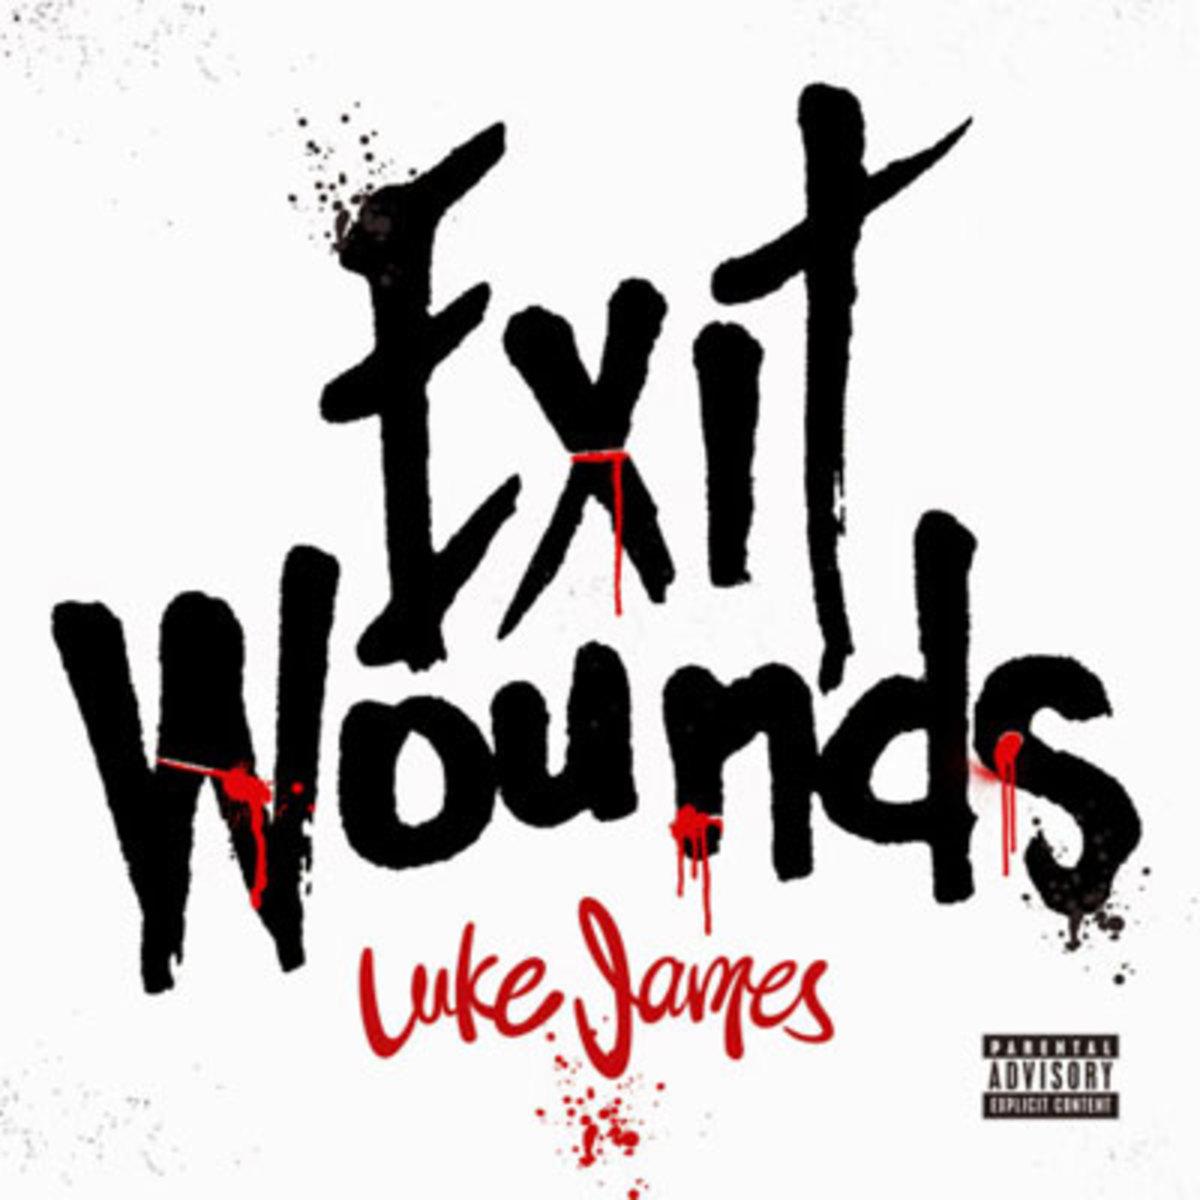 lukejames-exitwounds.jpg